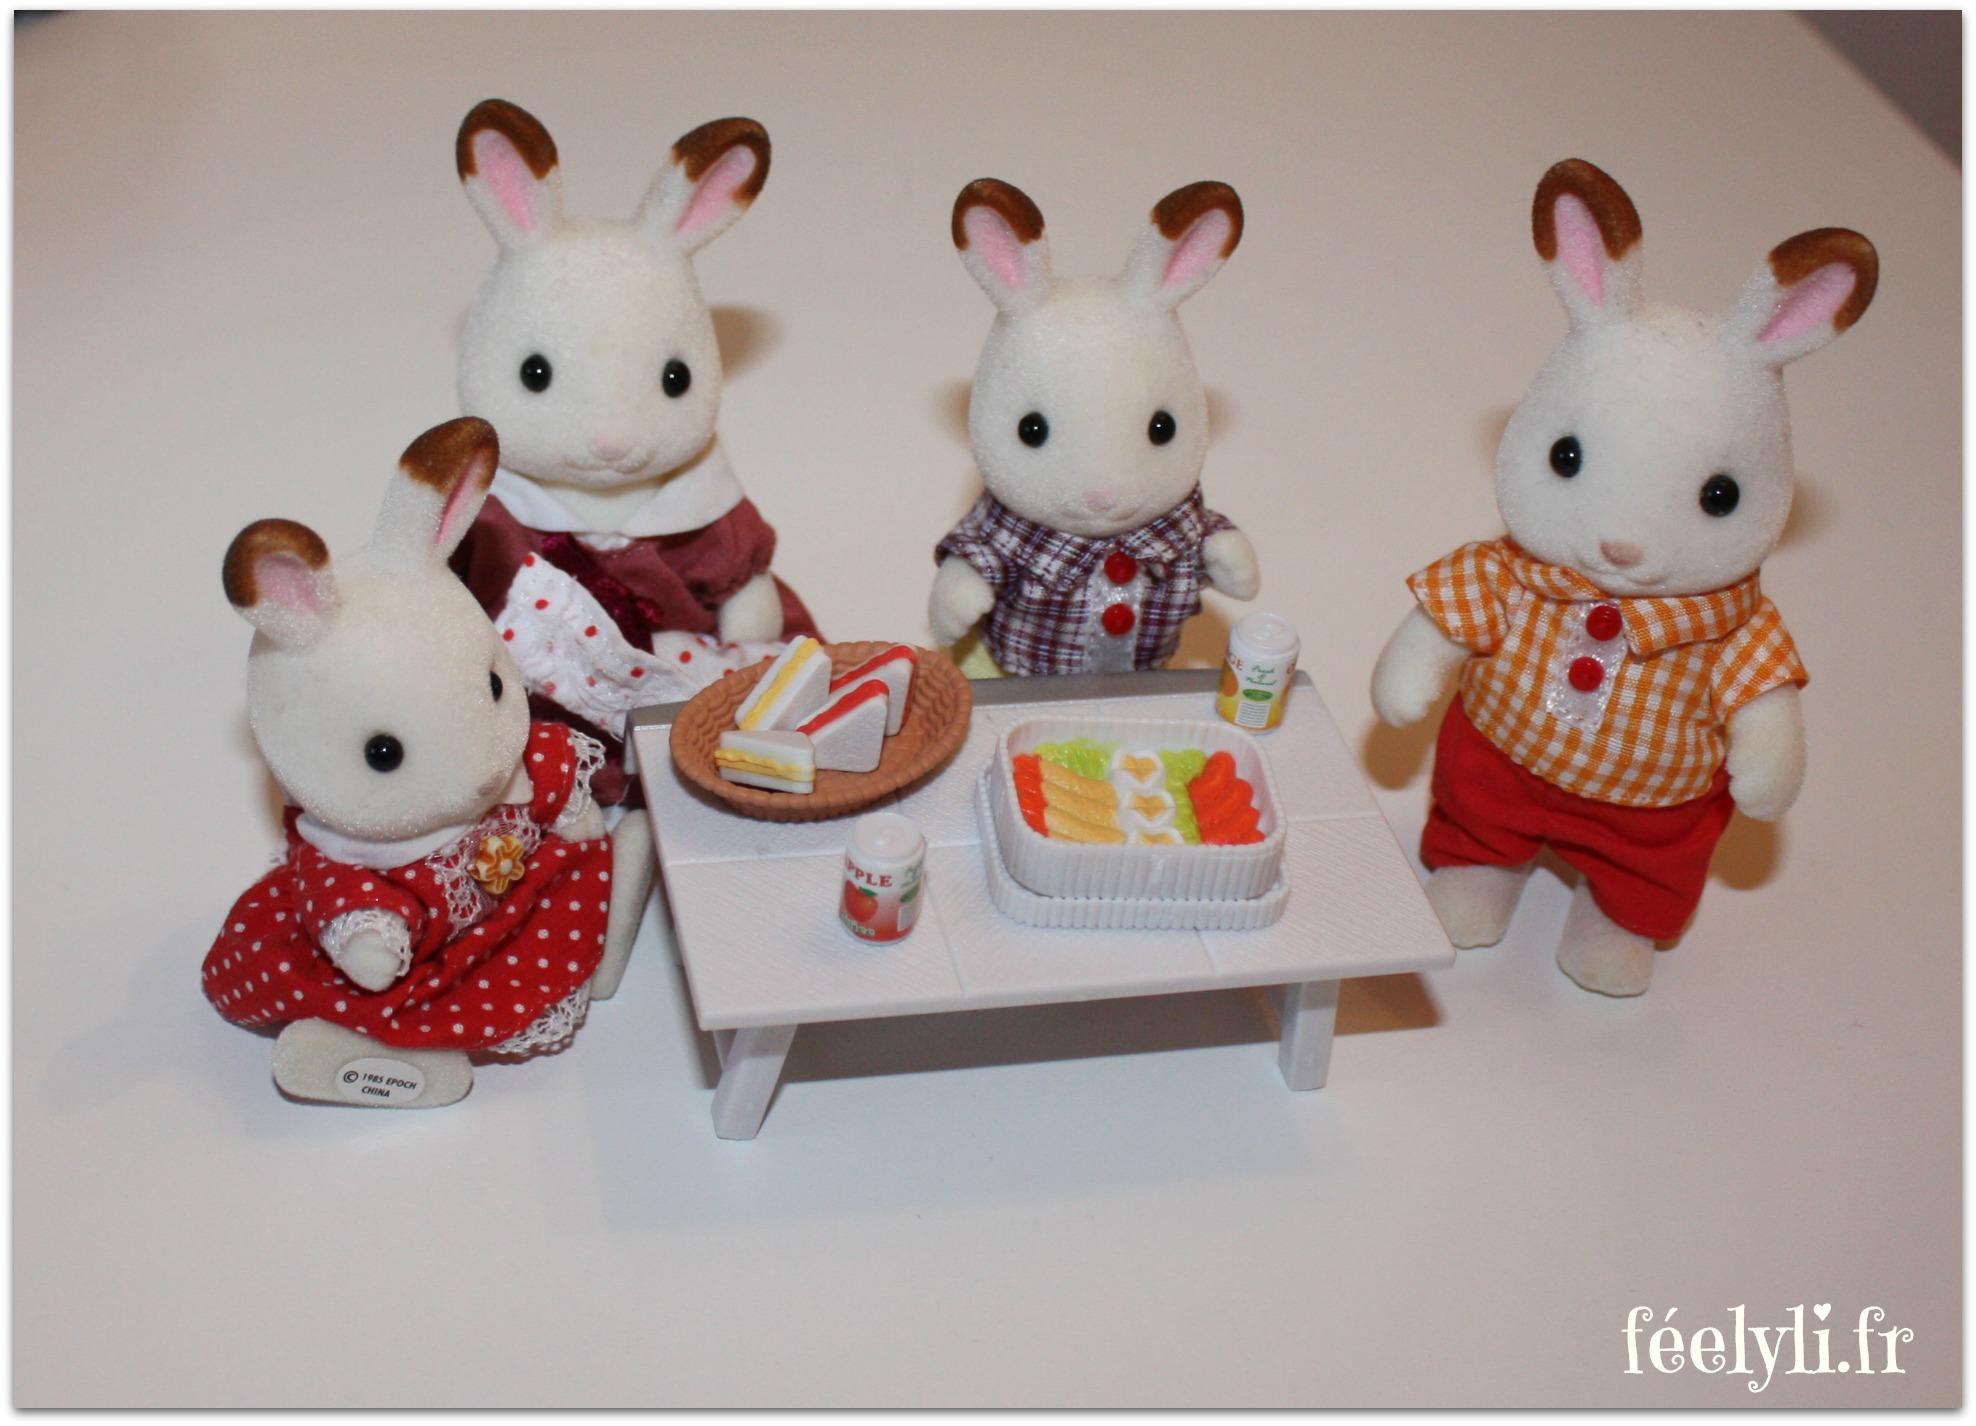 famille lapin chocolat sylvanian